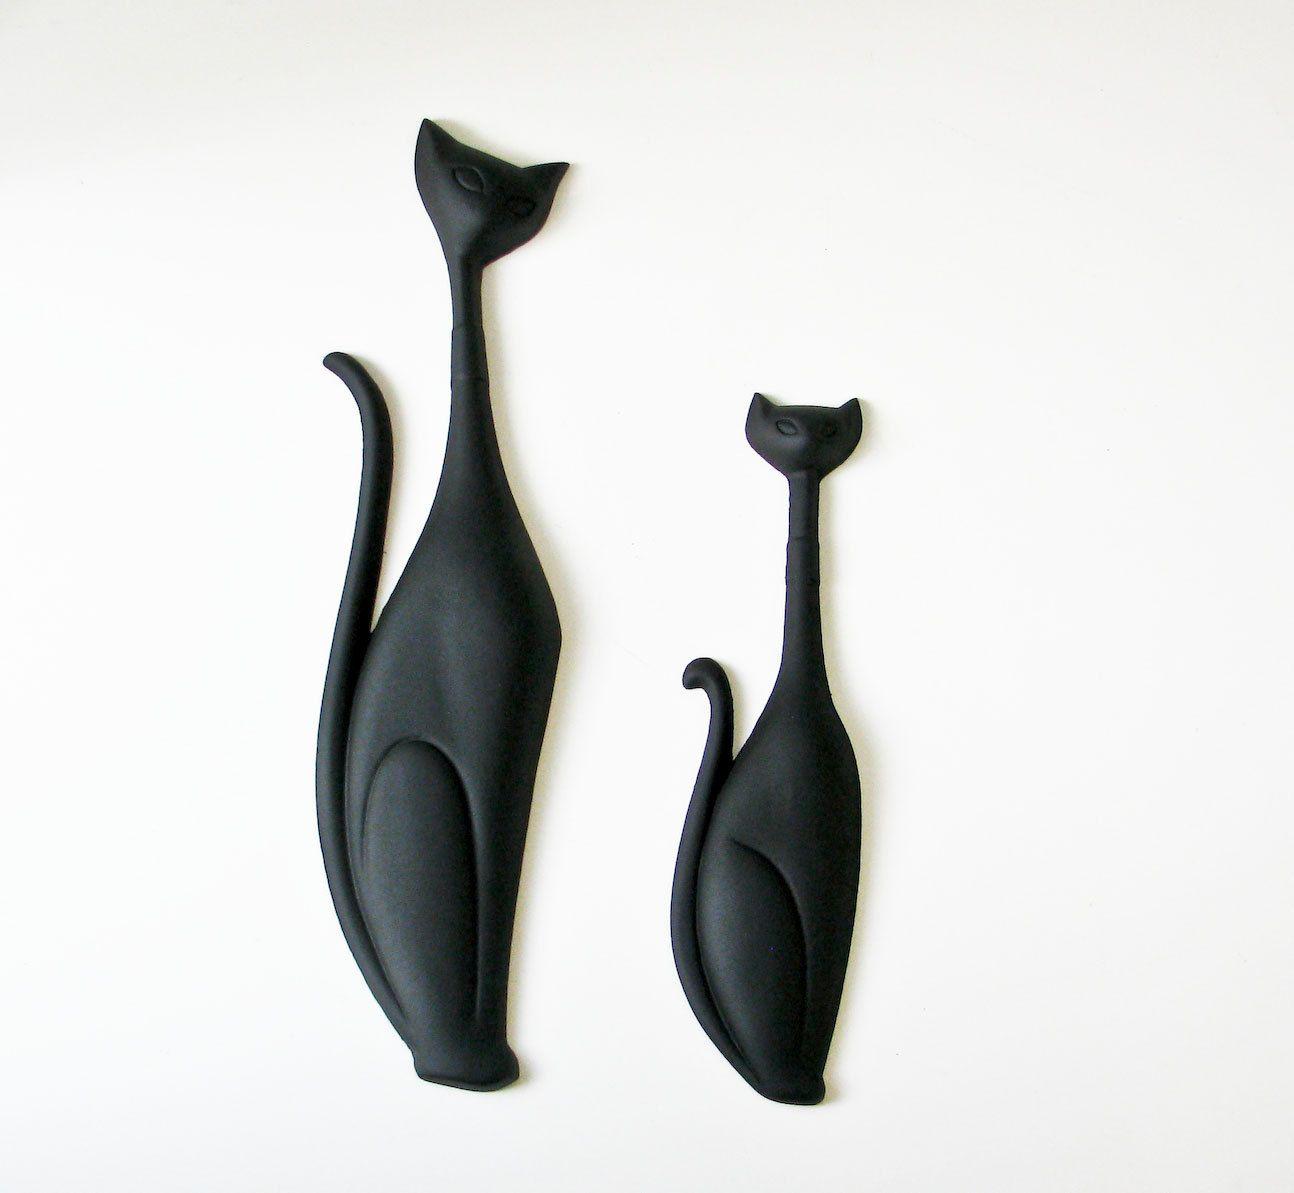 Cat Wall Decor mid century modern black cat plaques - wall art | cool cat